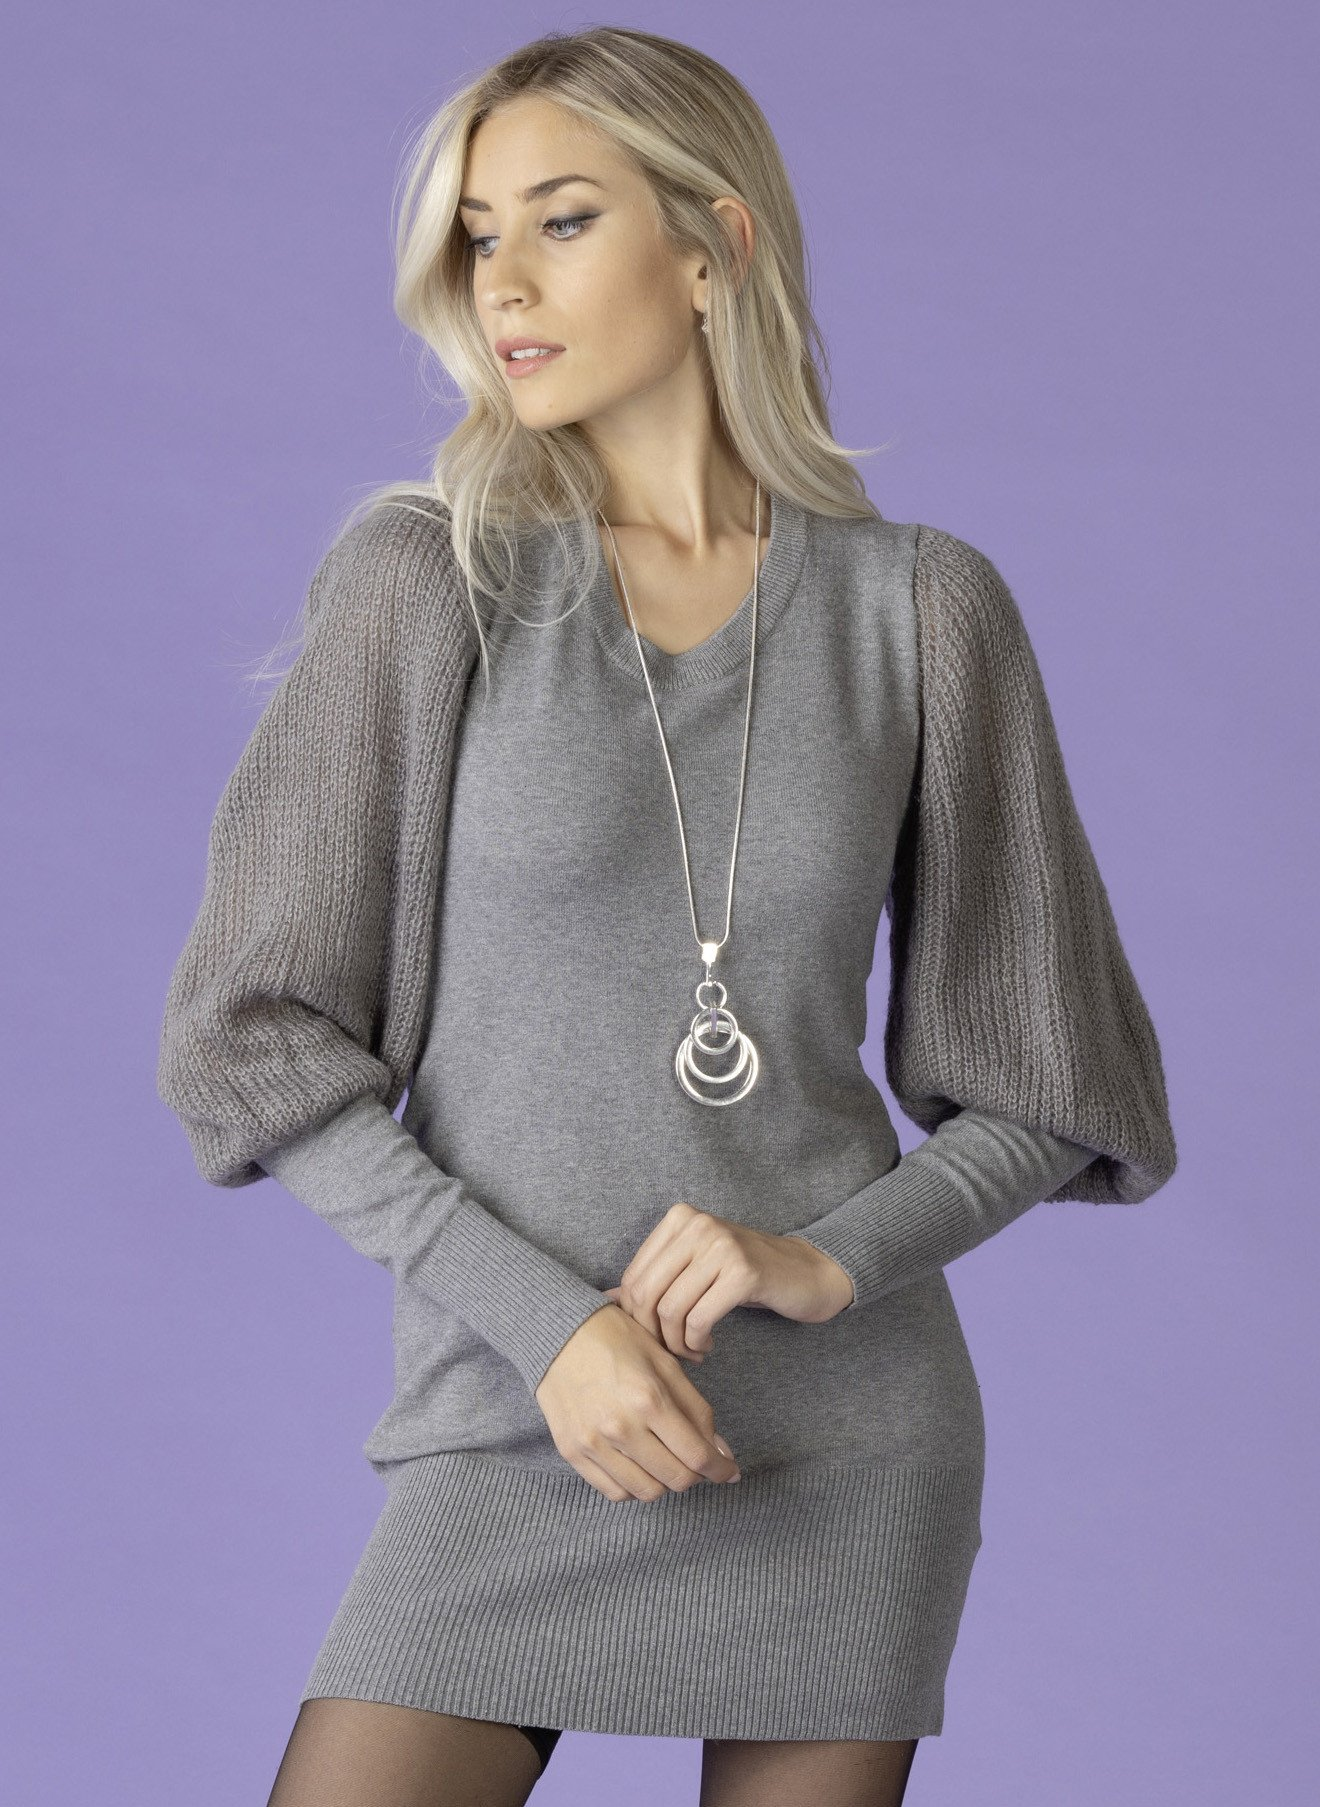 D-Strick-Top/Kleid grau mel. L 004